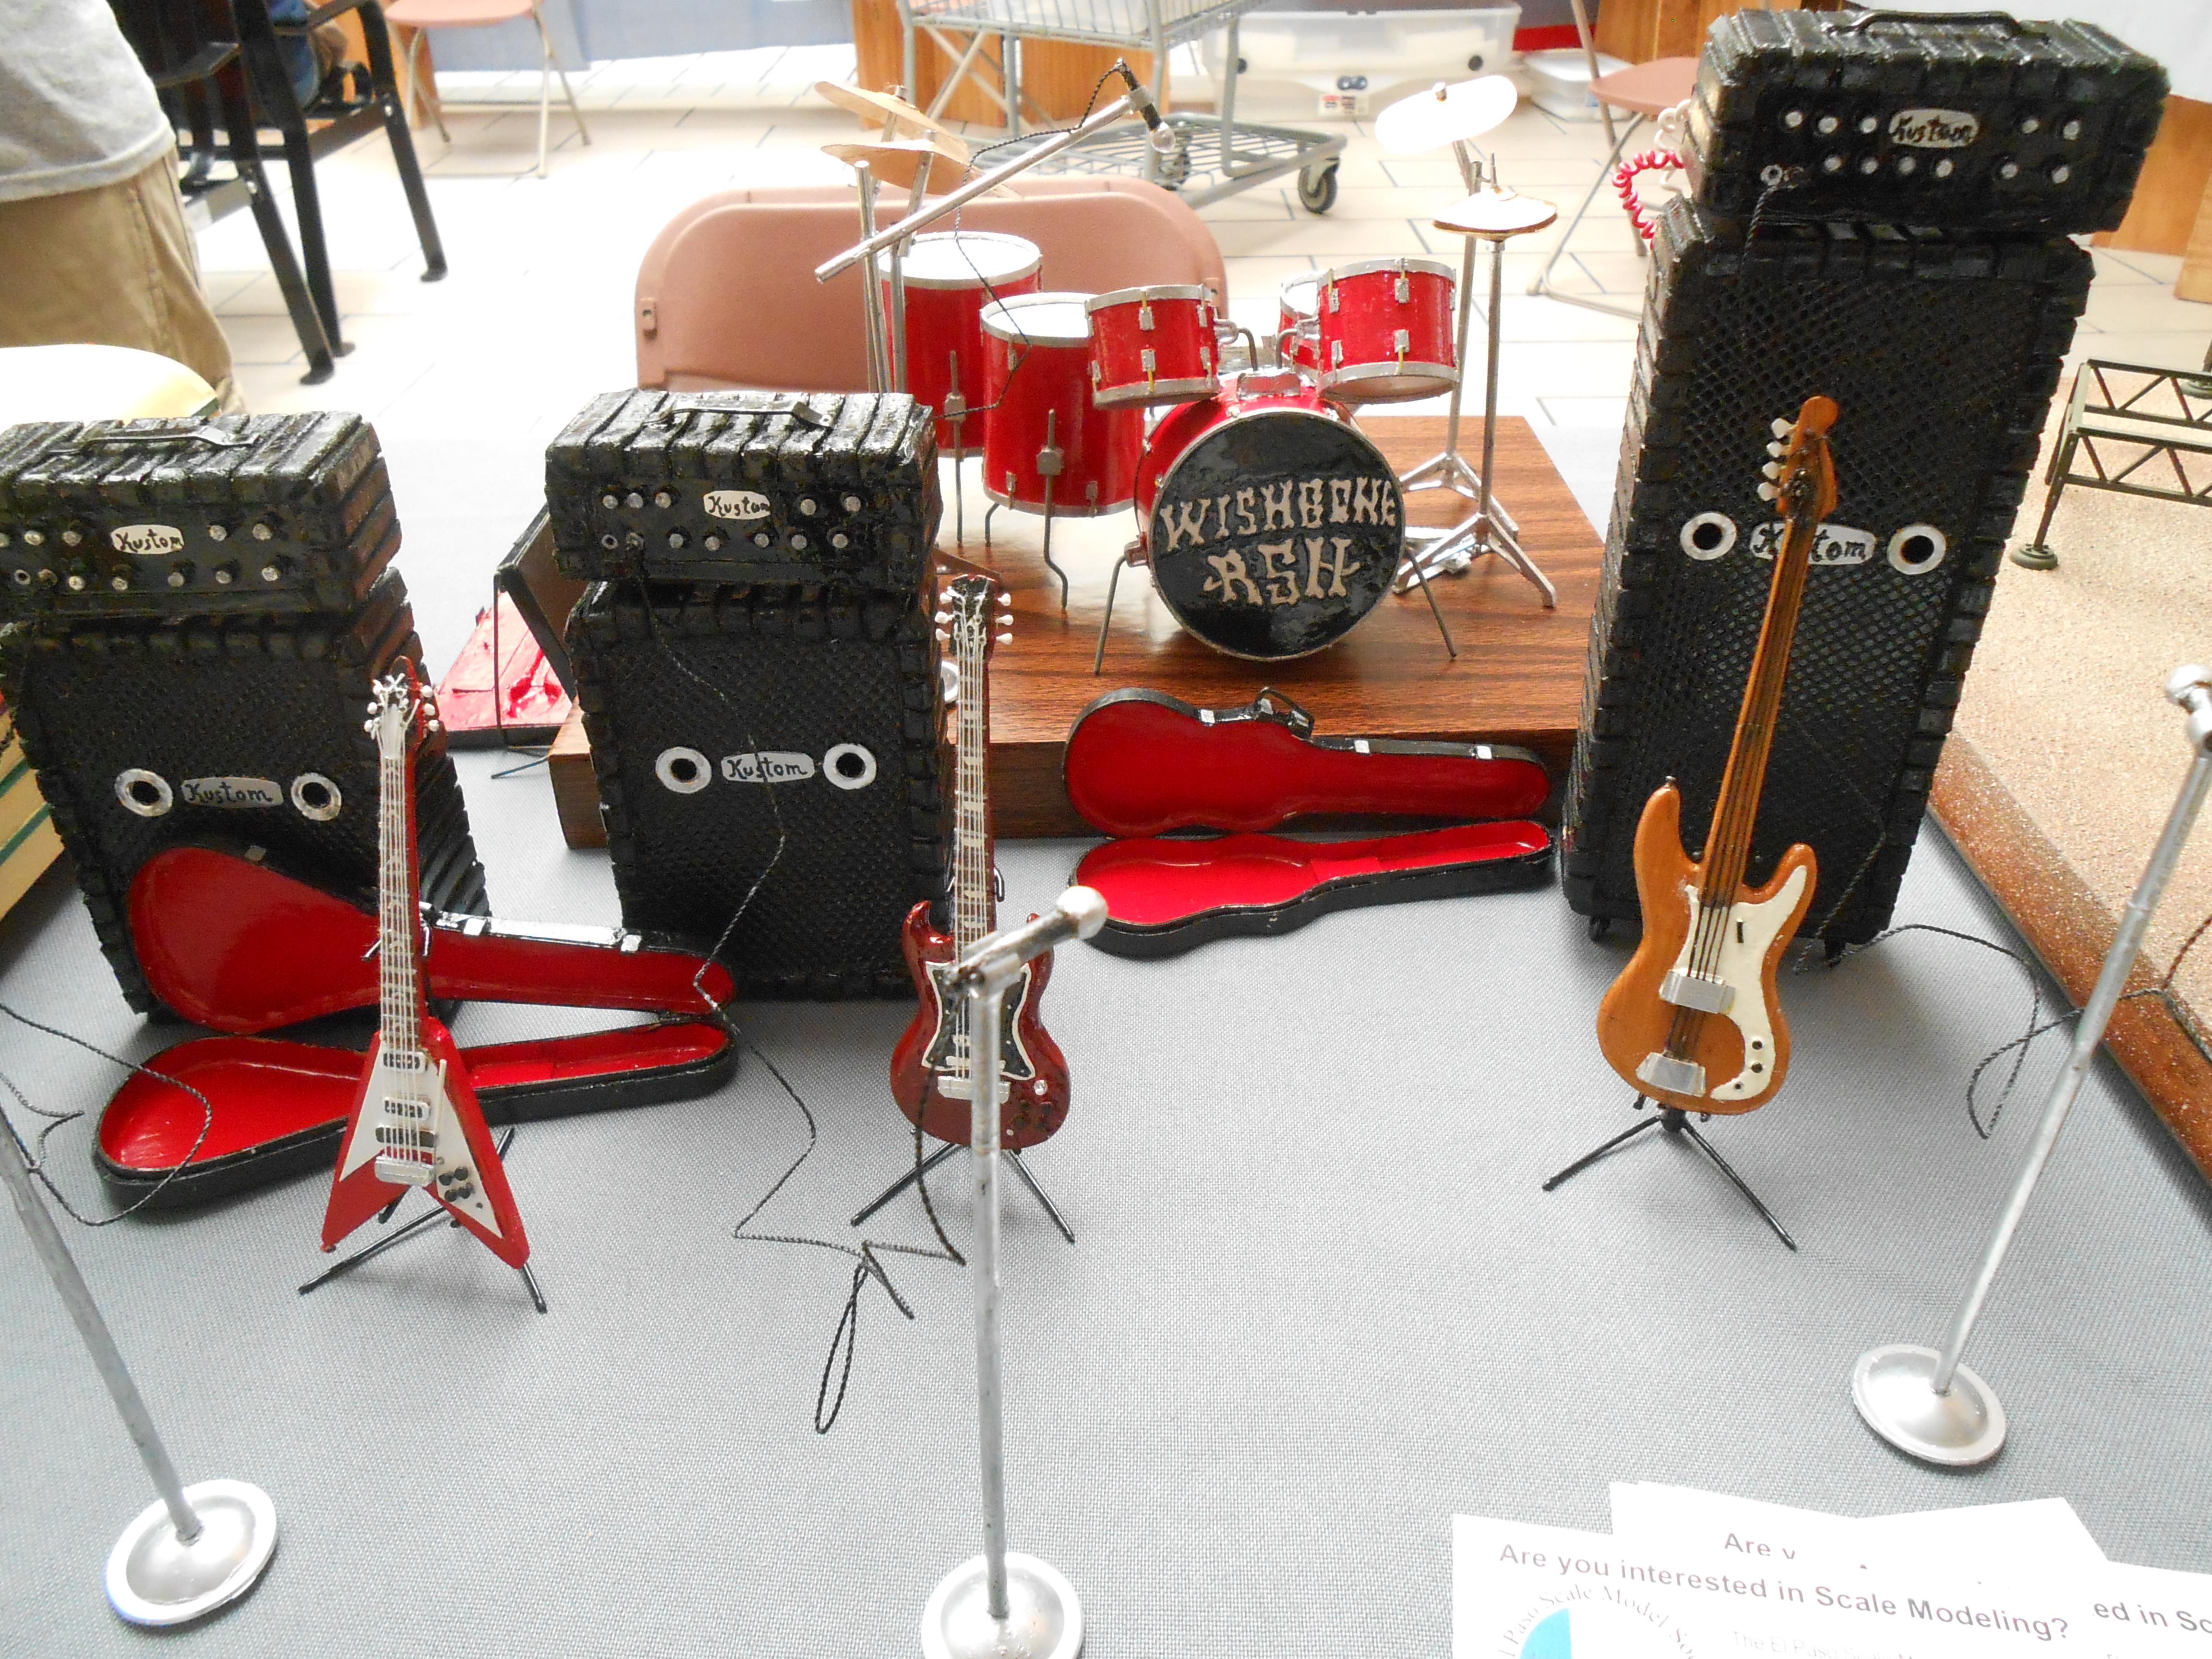 Jose C. Diaz: Scratch-built guitars